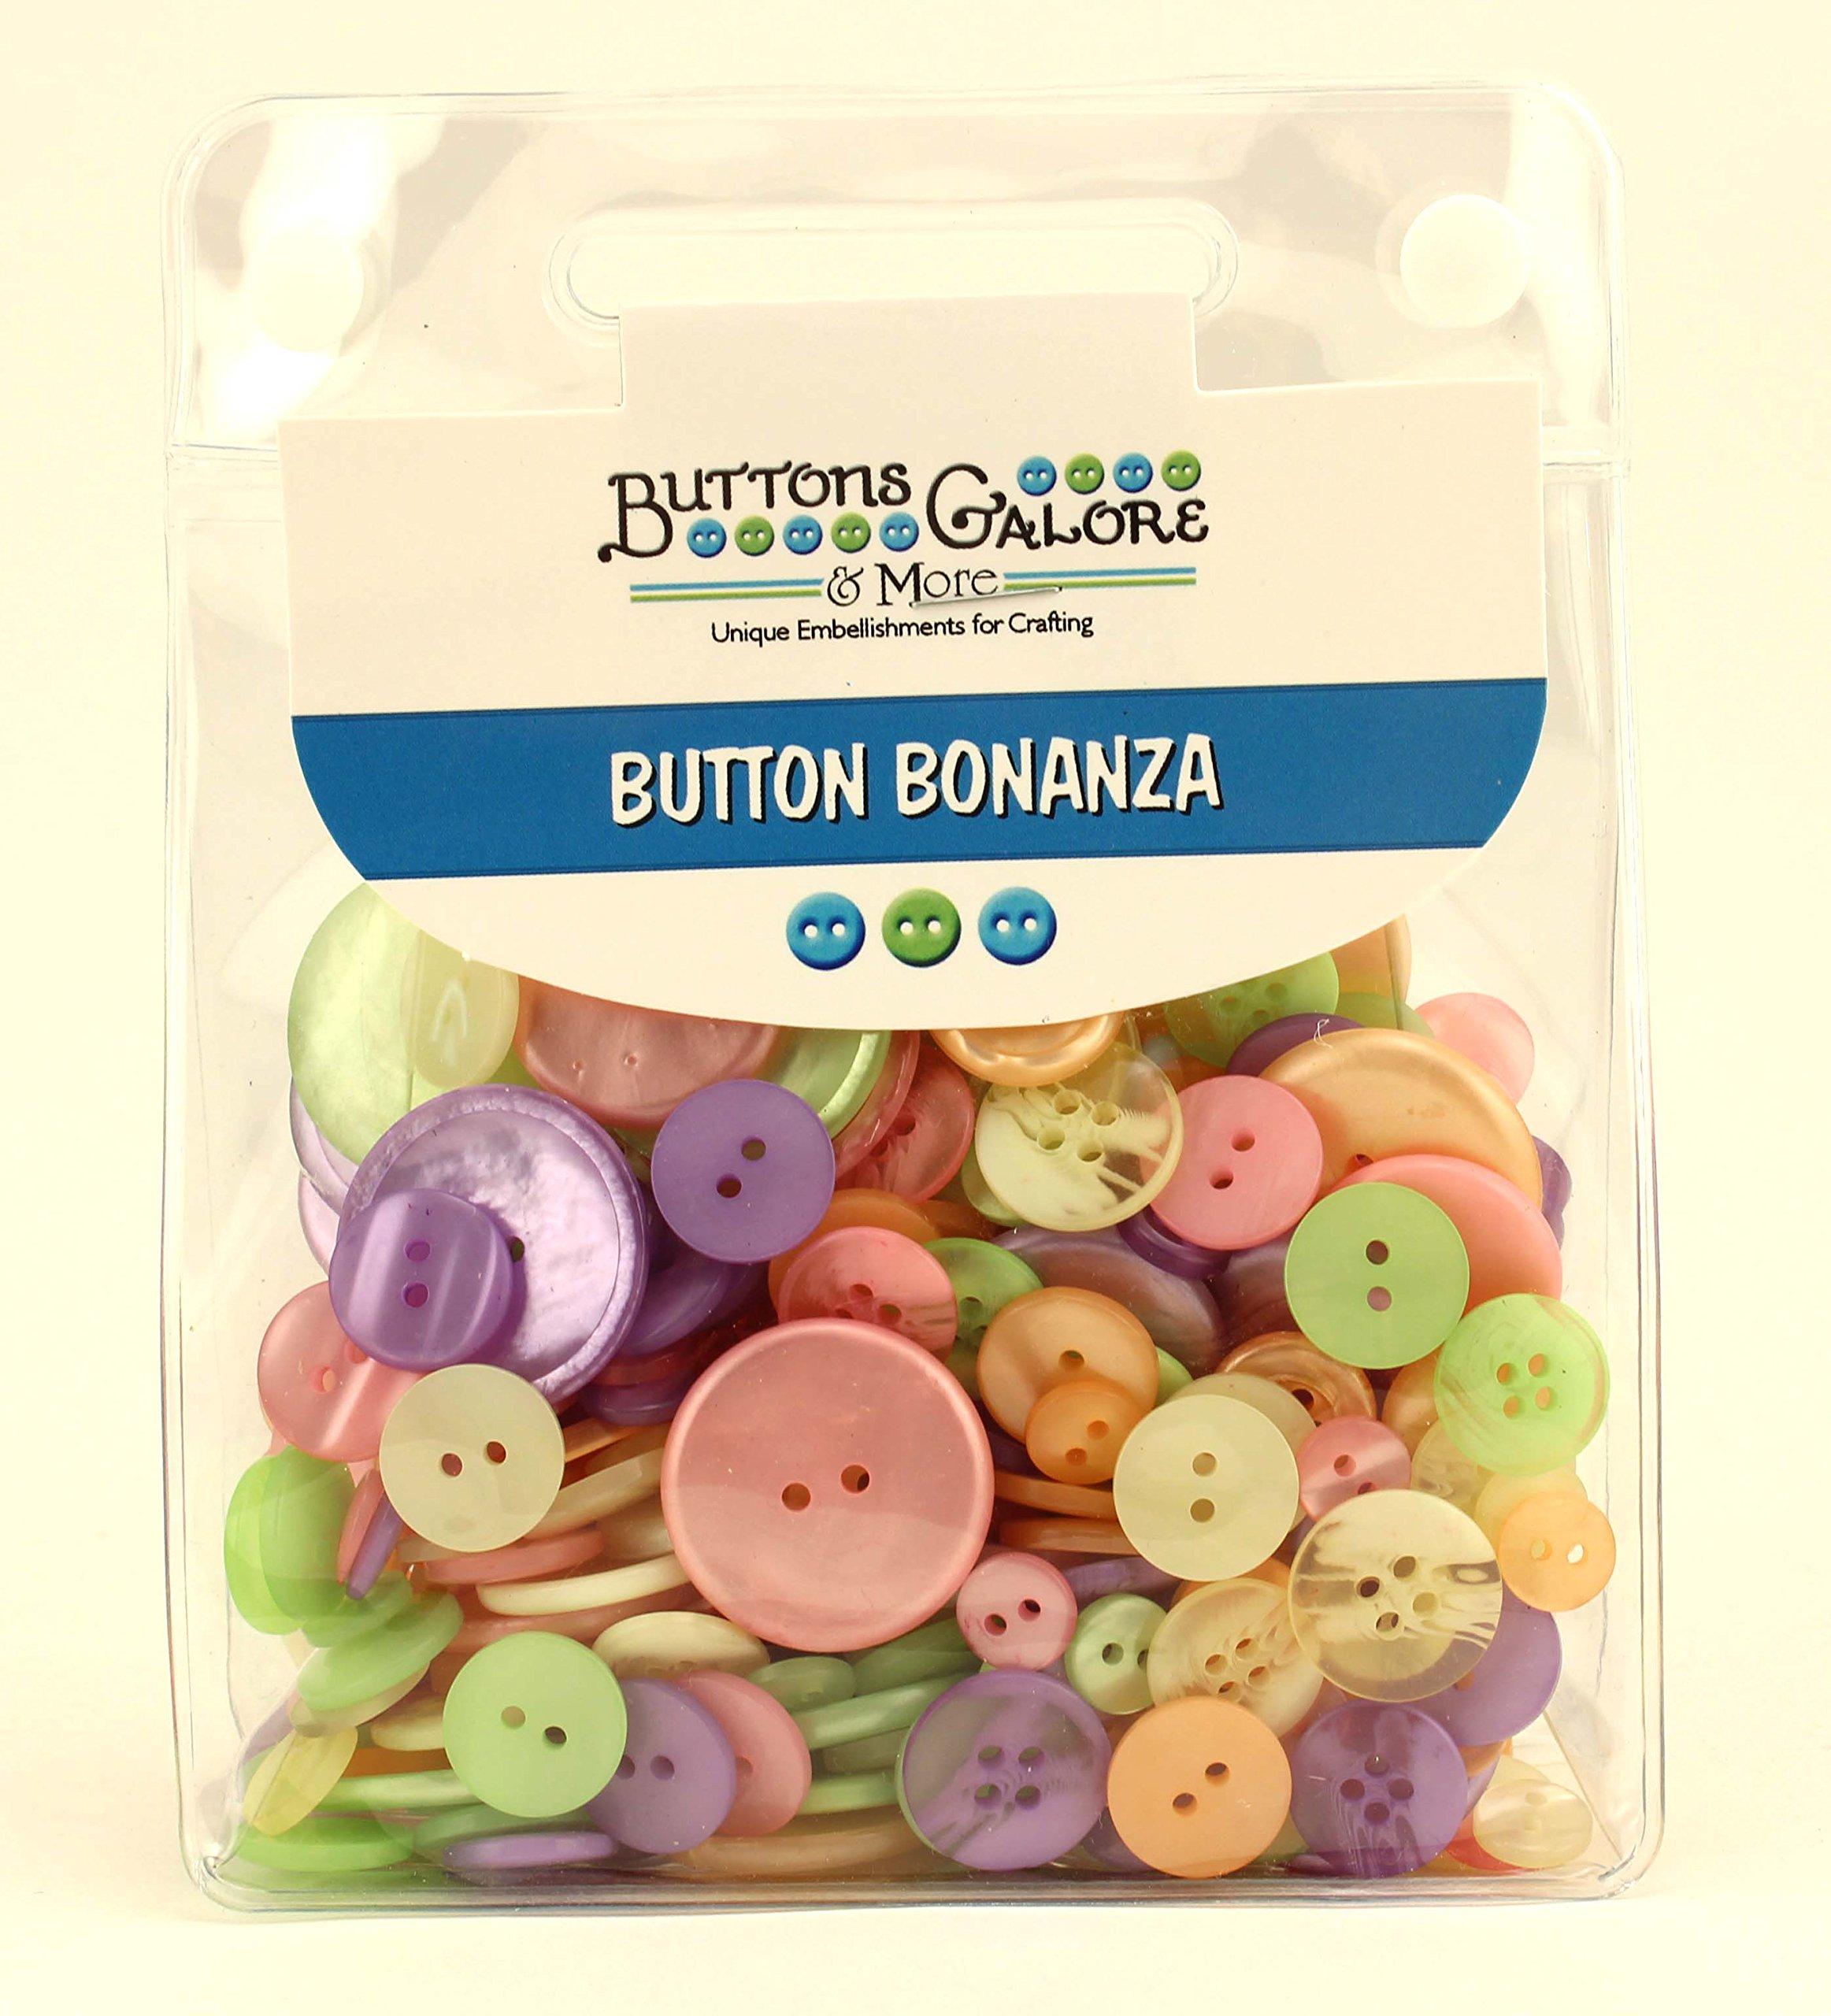 Buttons Galore Button Bonanza, Candy Store